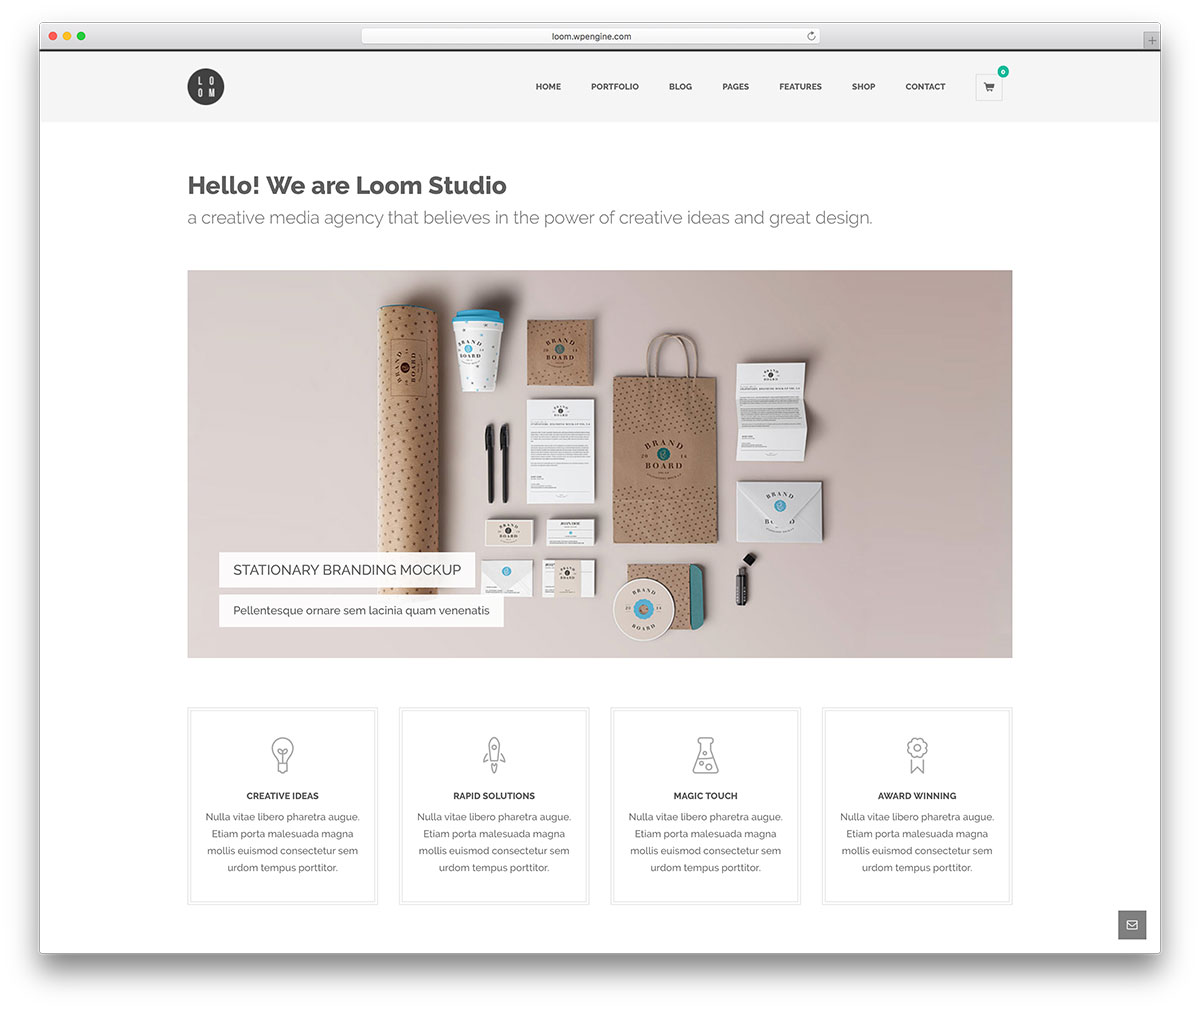 loom-simple-business-site-template